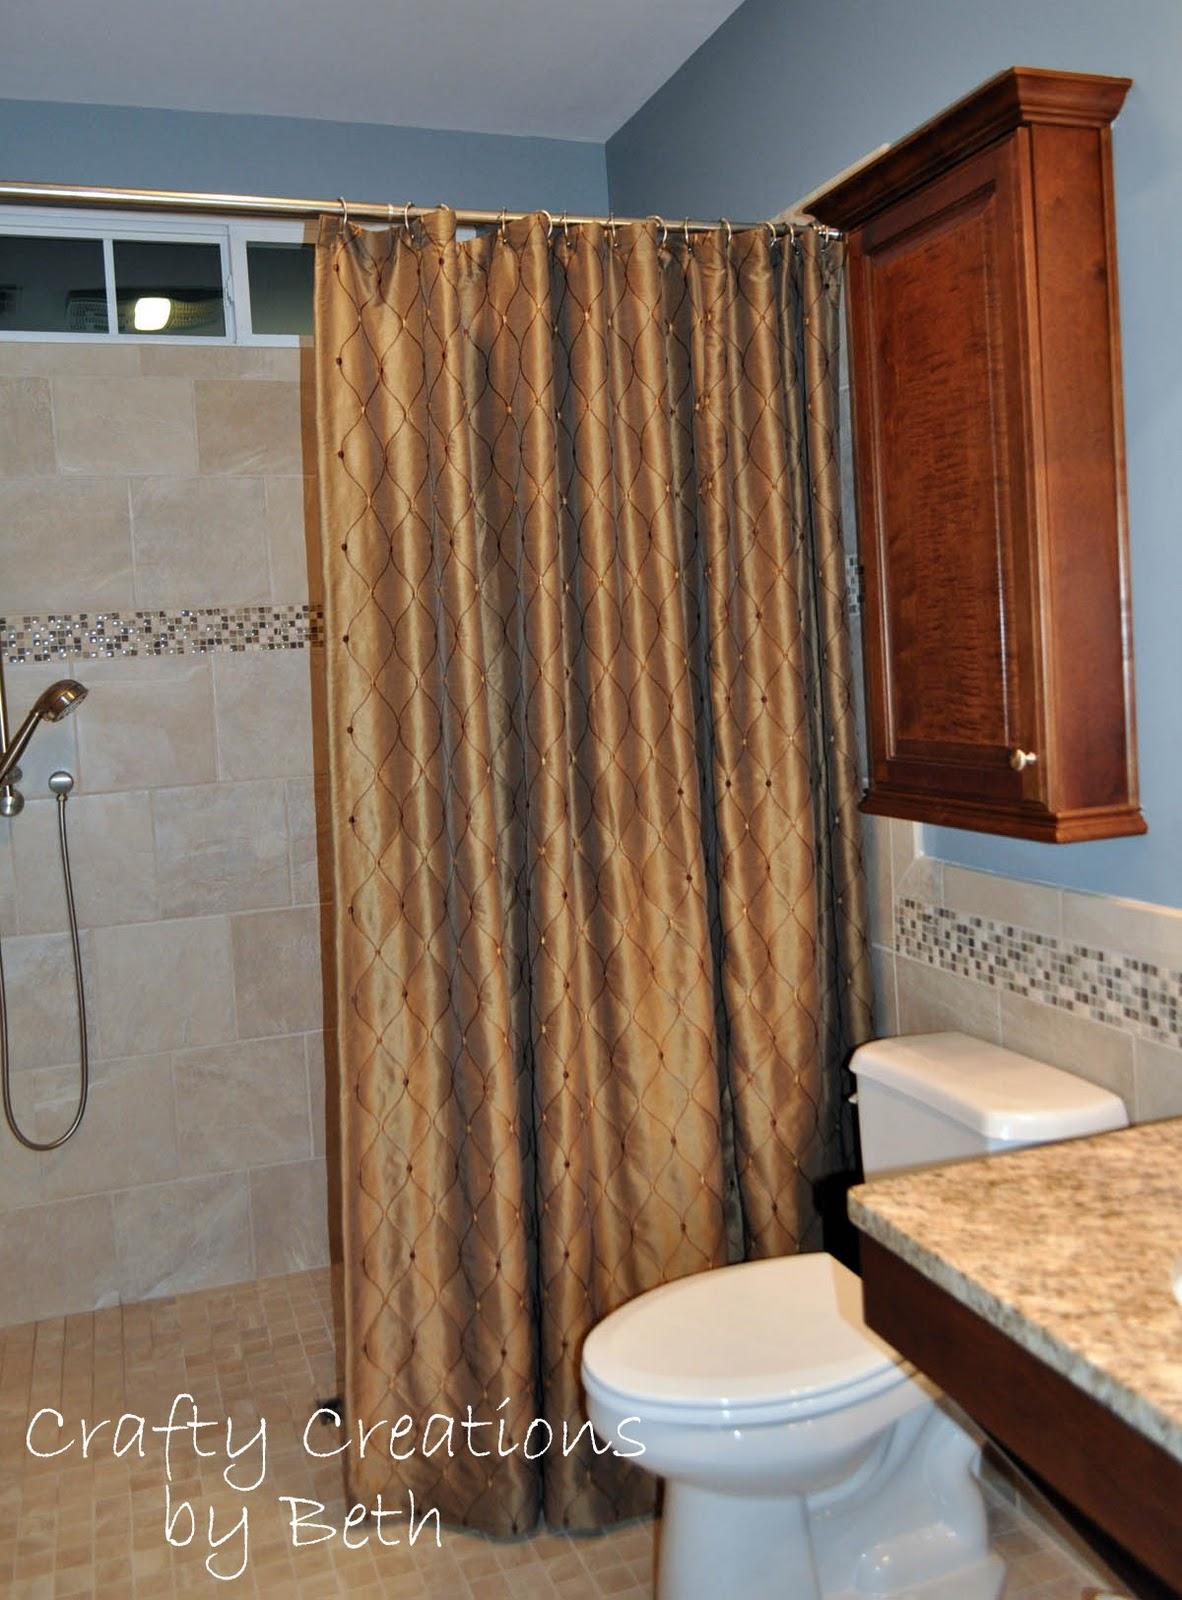 Wheelchair Accessible Bathroom Remodel Sonya Hamilton Designs - Accessible bathroom remodel